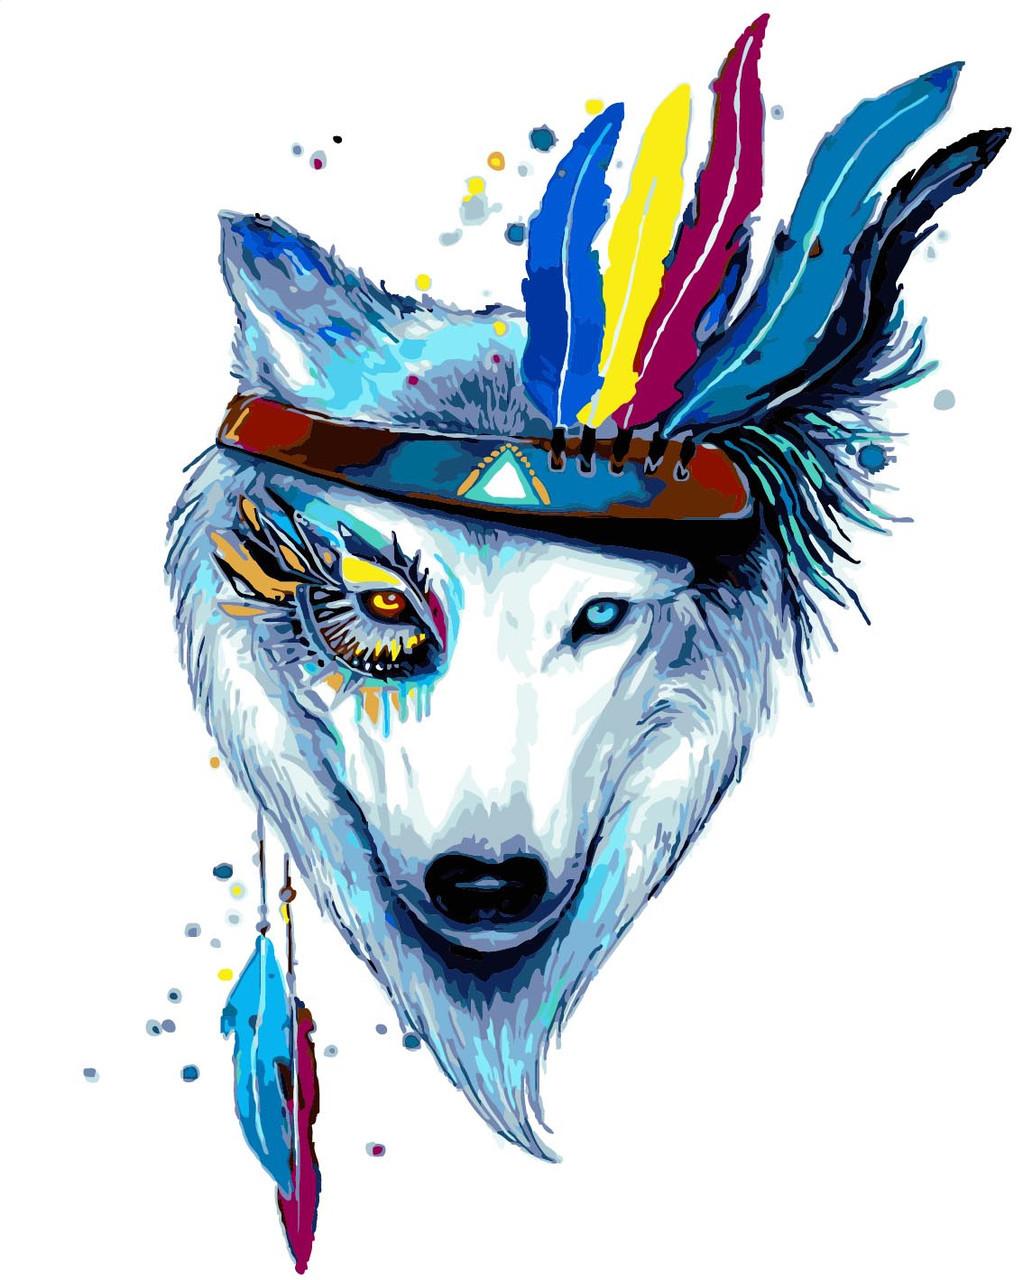 Картина по номерам Белая волчица 40 х 50 см (KHO4019)